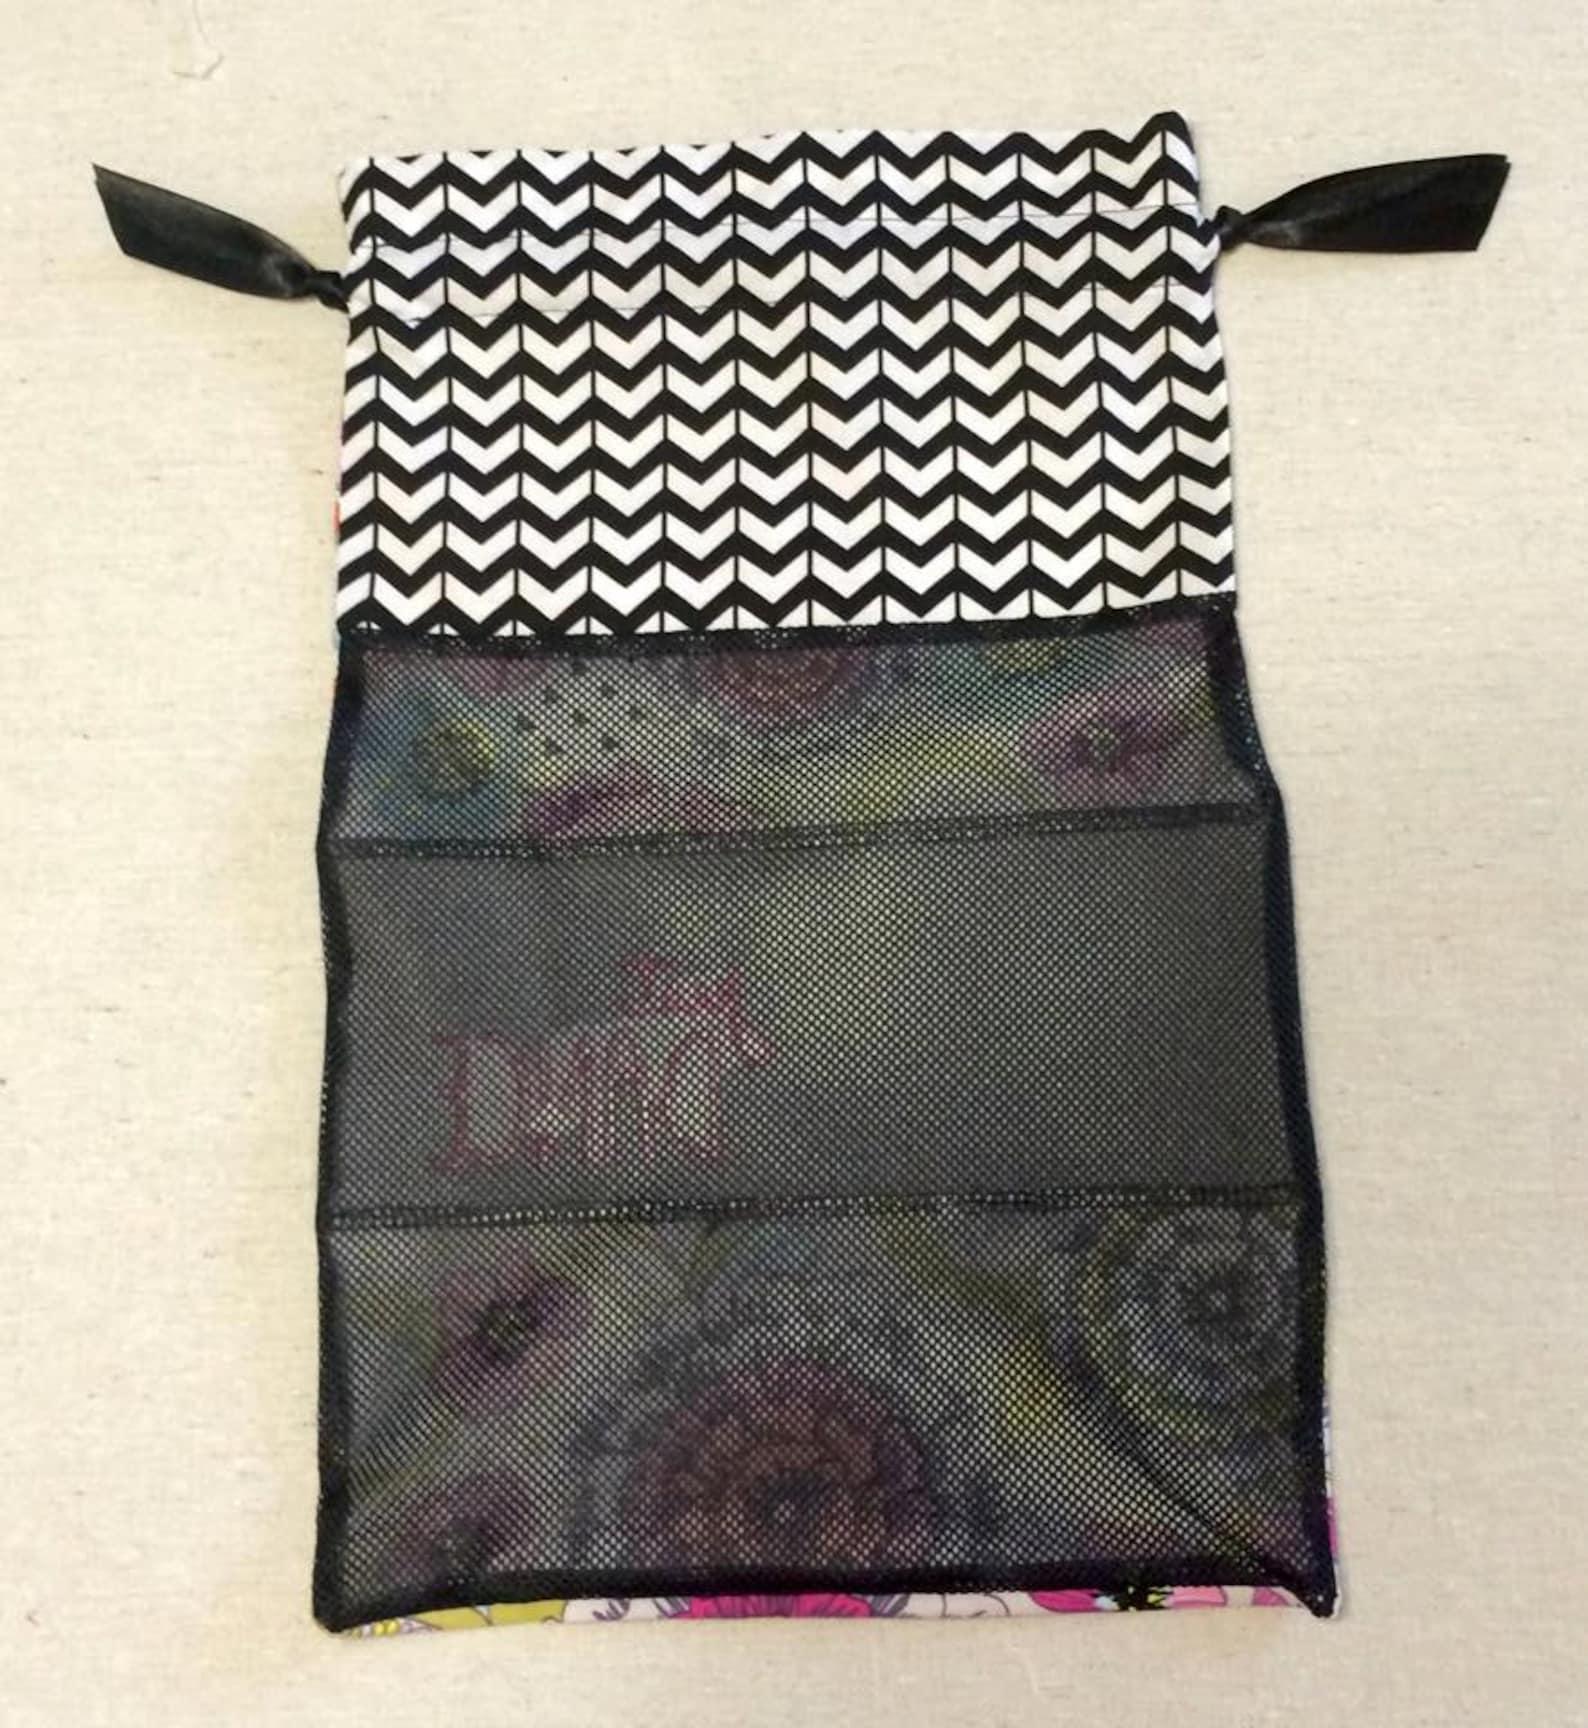 item(j3) personalized dance shoe bag just dance chevron pink floral black mesh ballet pointe jazz tap